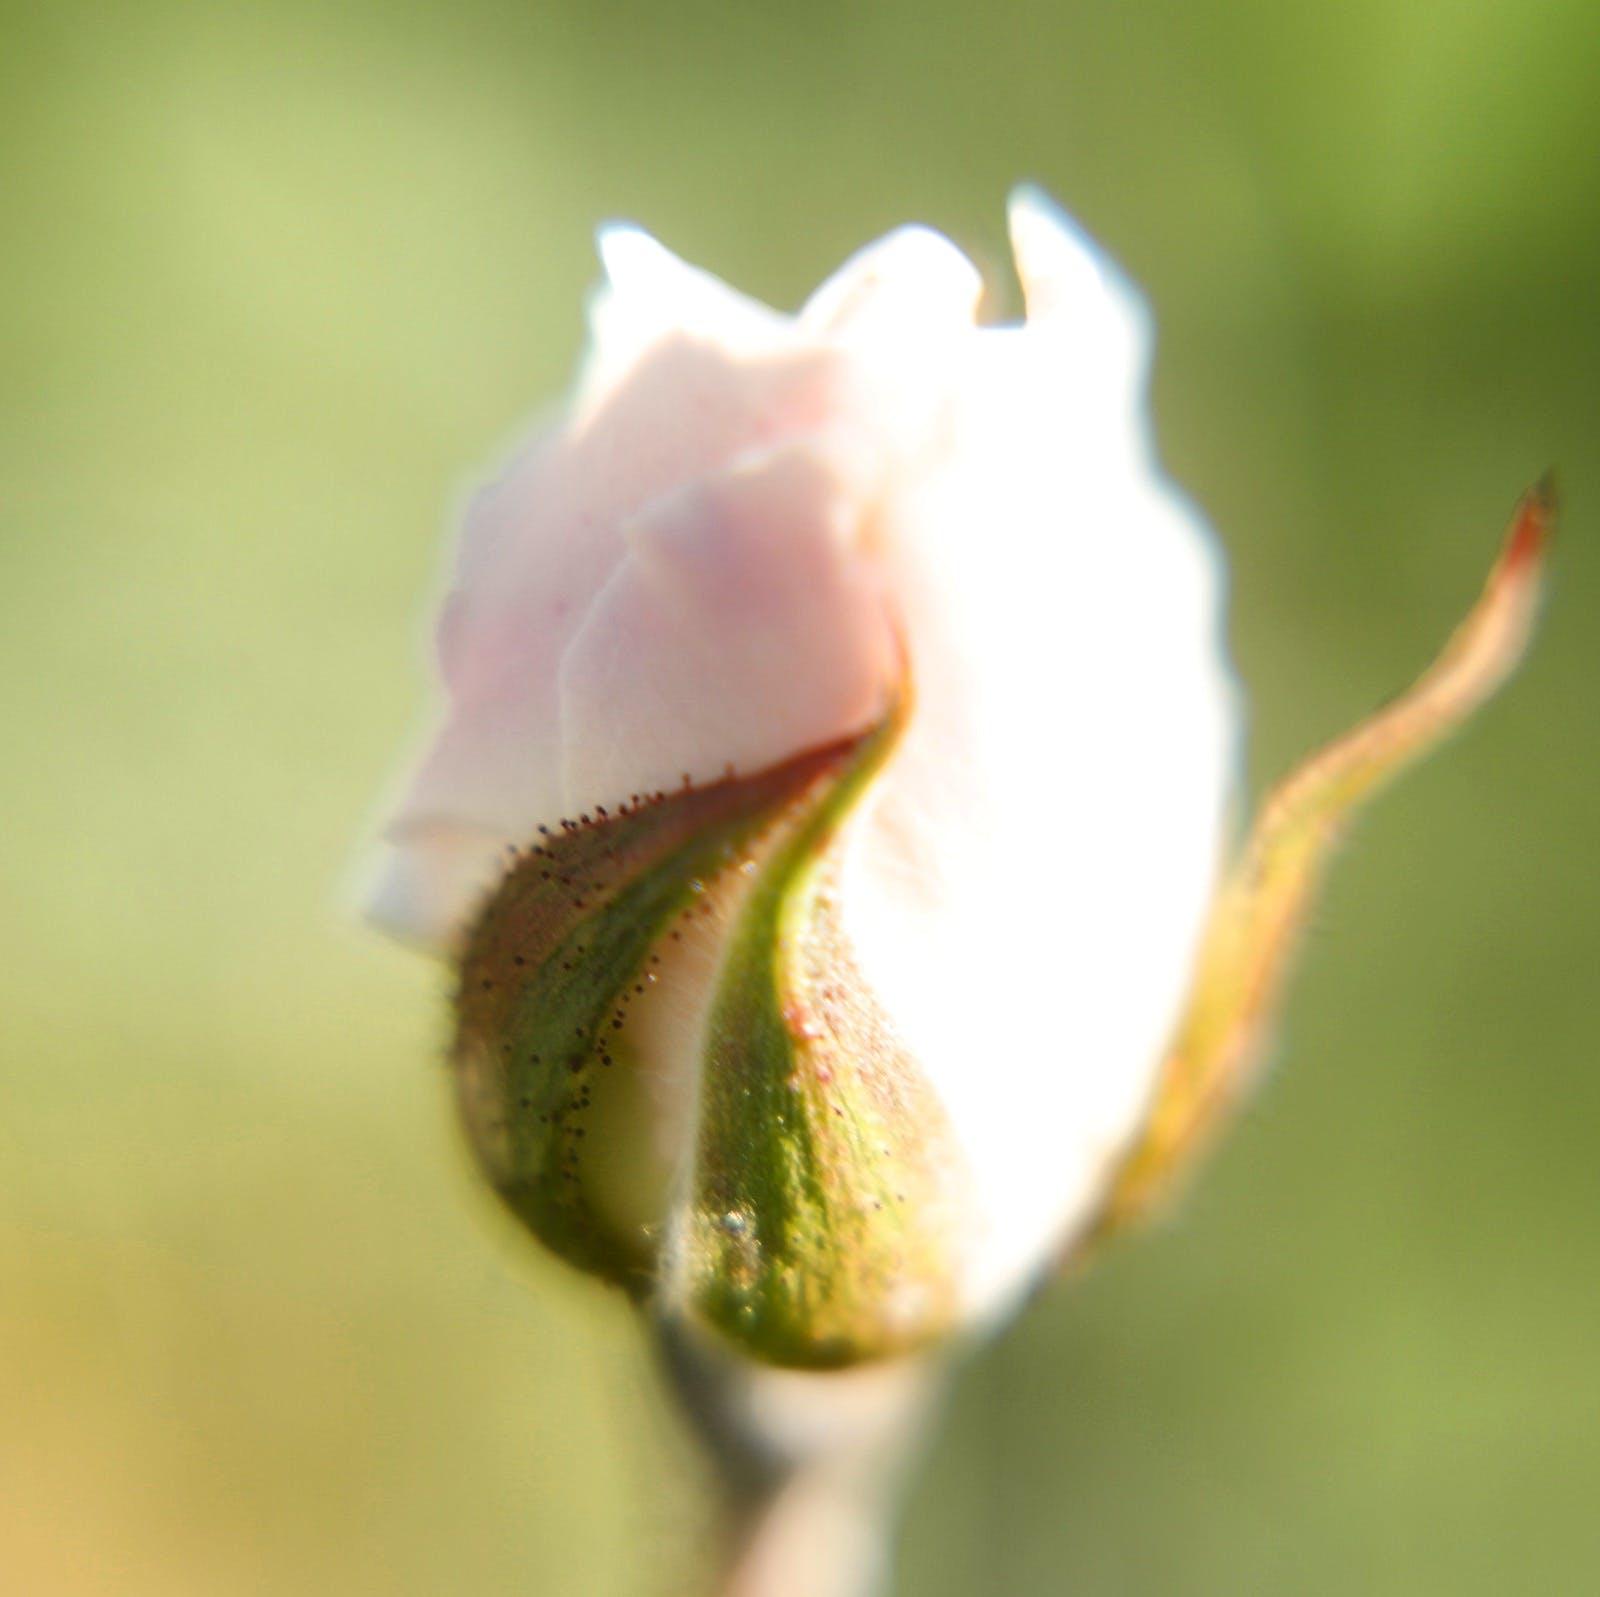 Gratis lagerfoto af lyserød rose